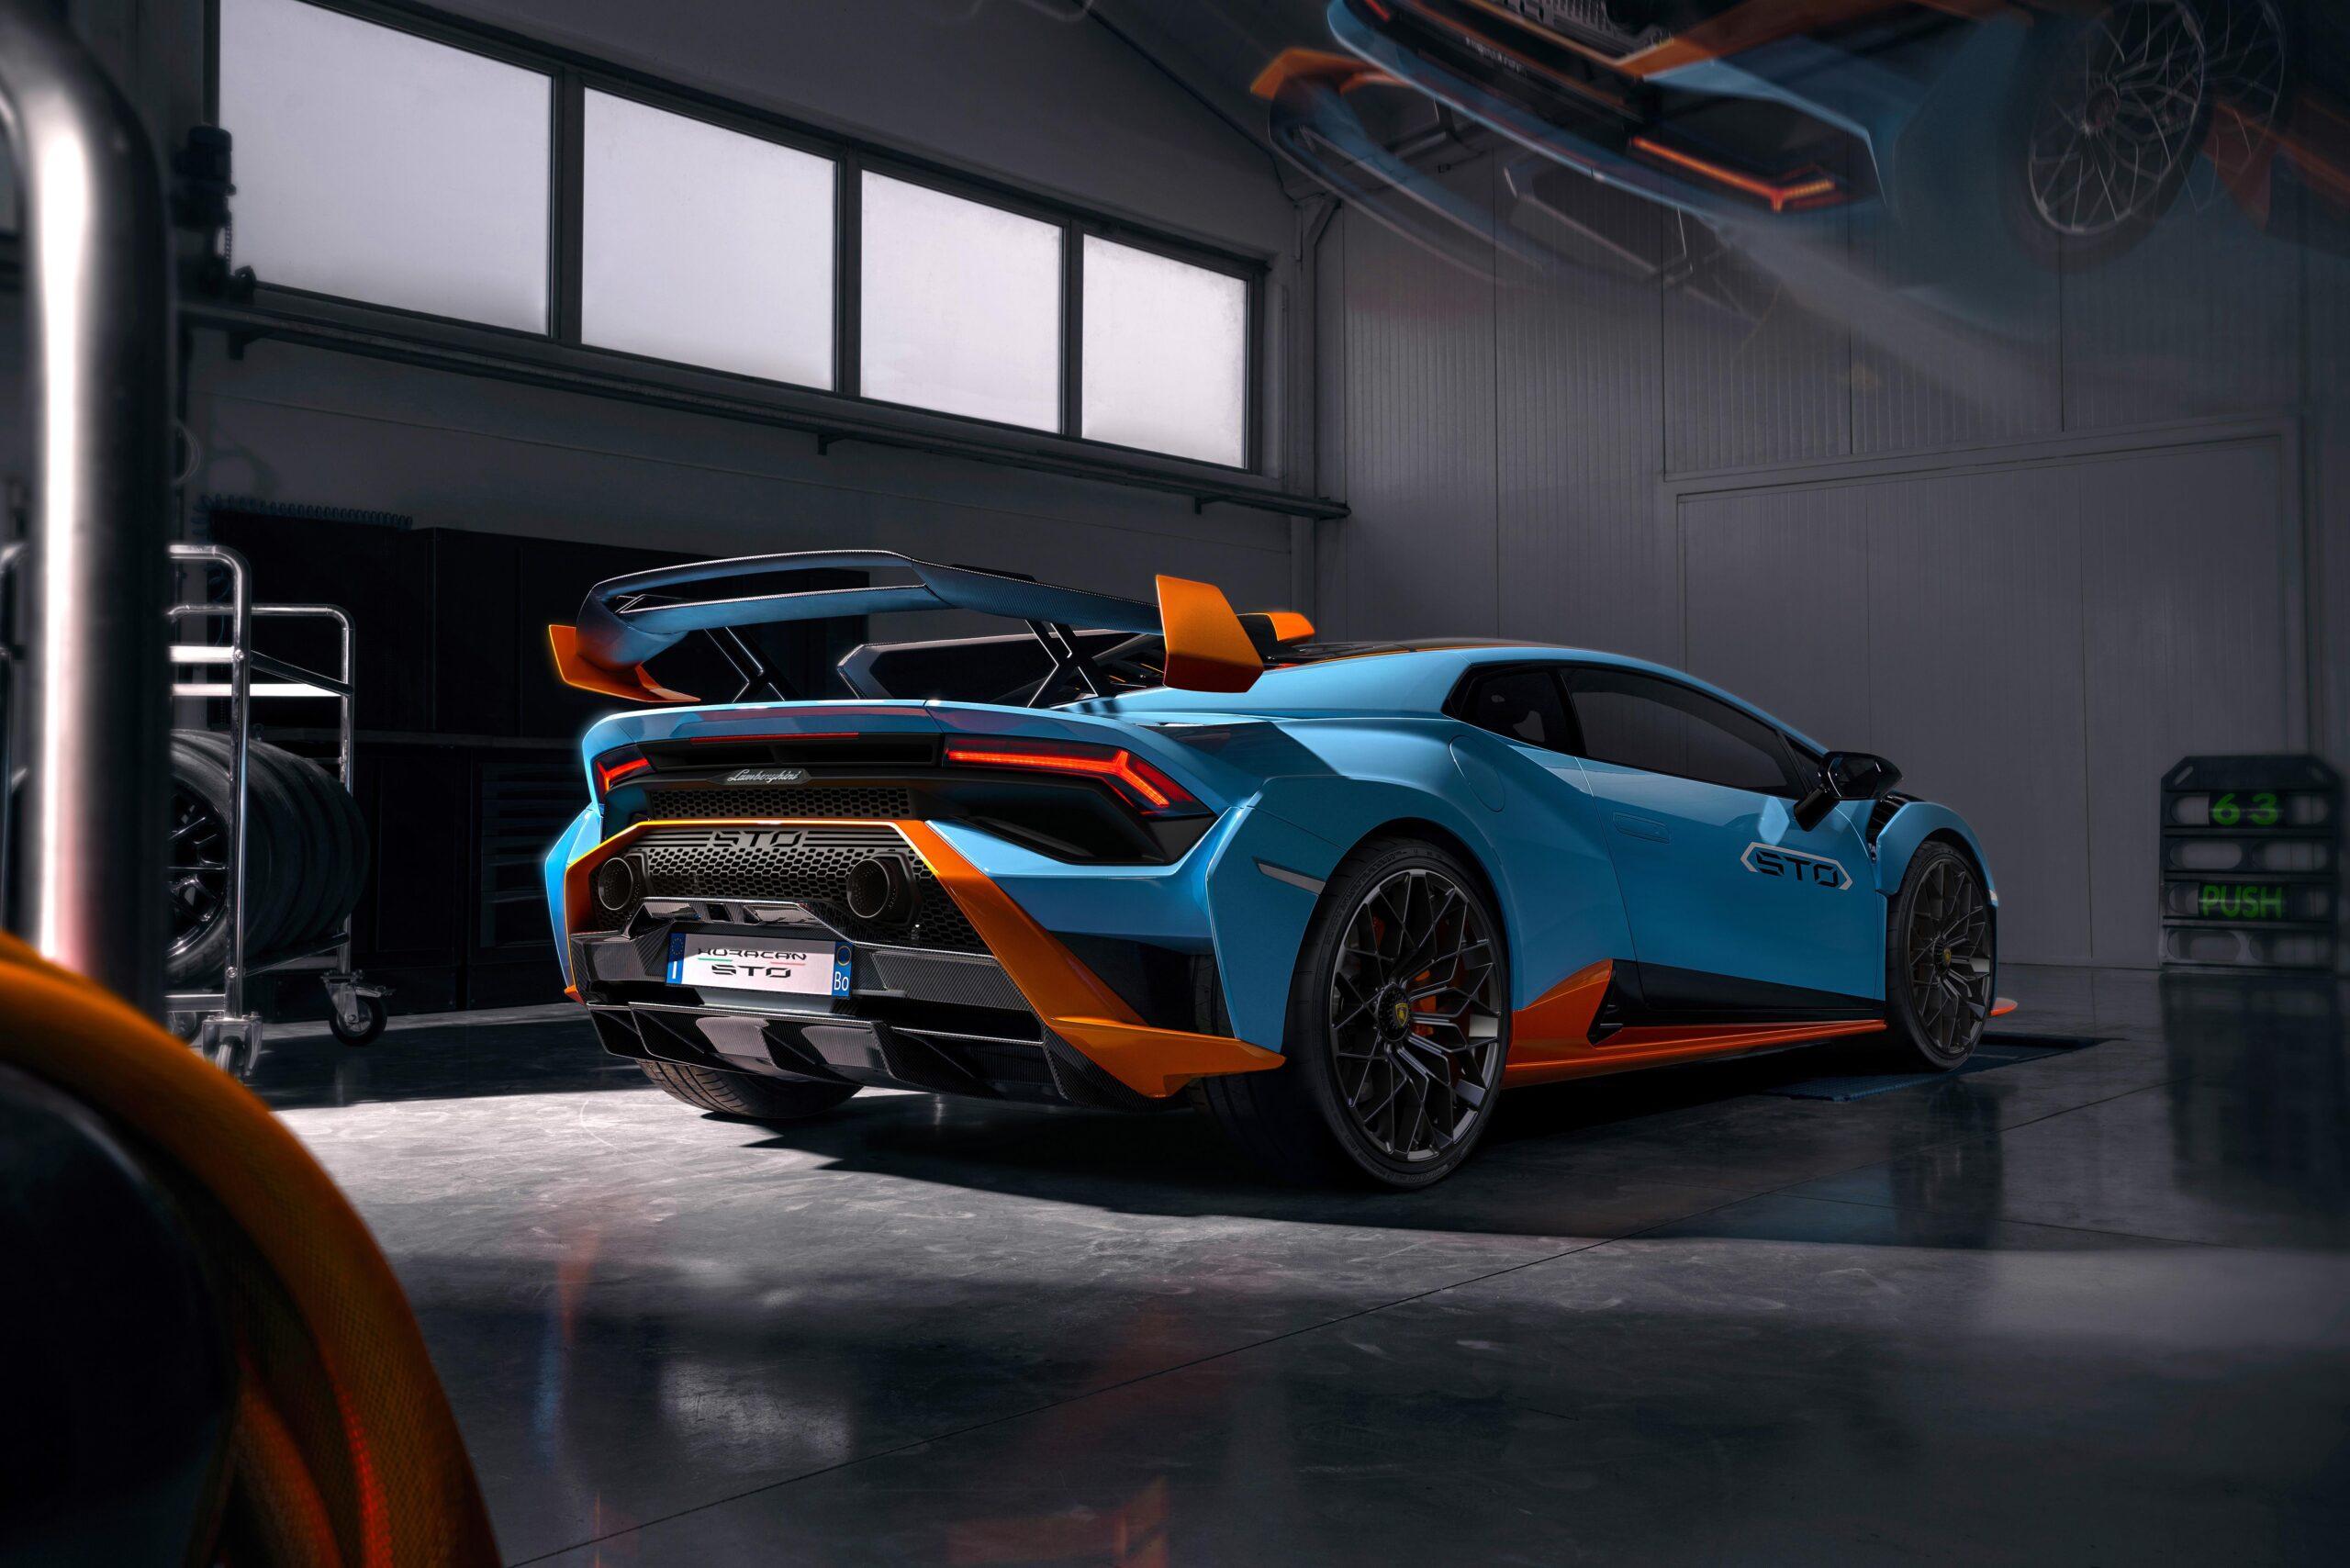 Lamborghini Huracan STO Retro